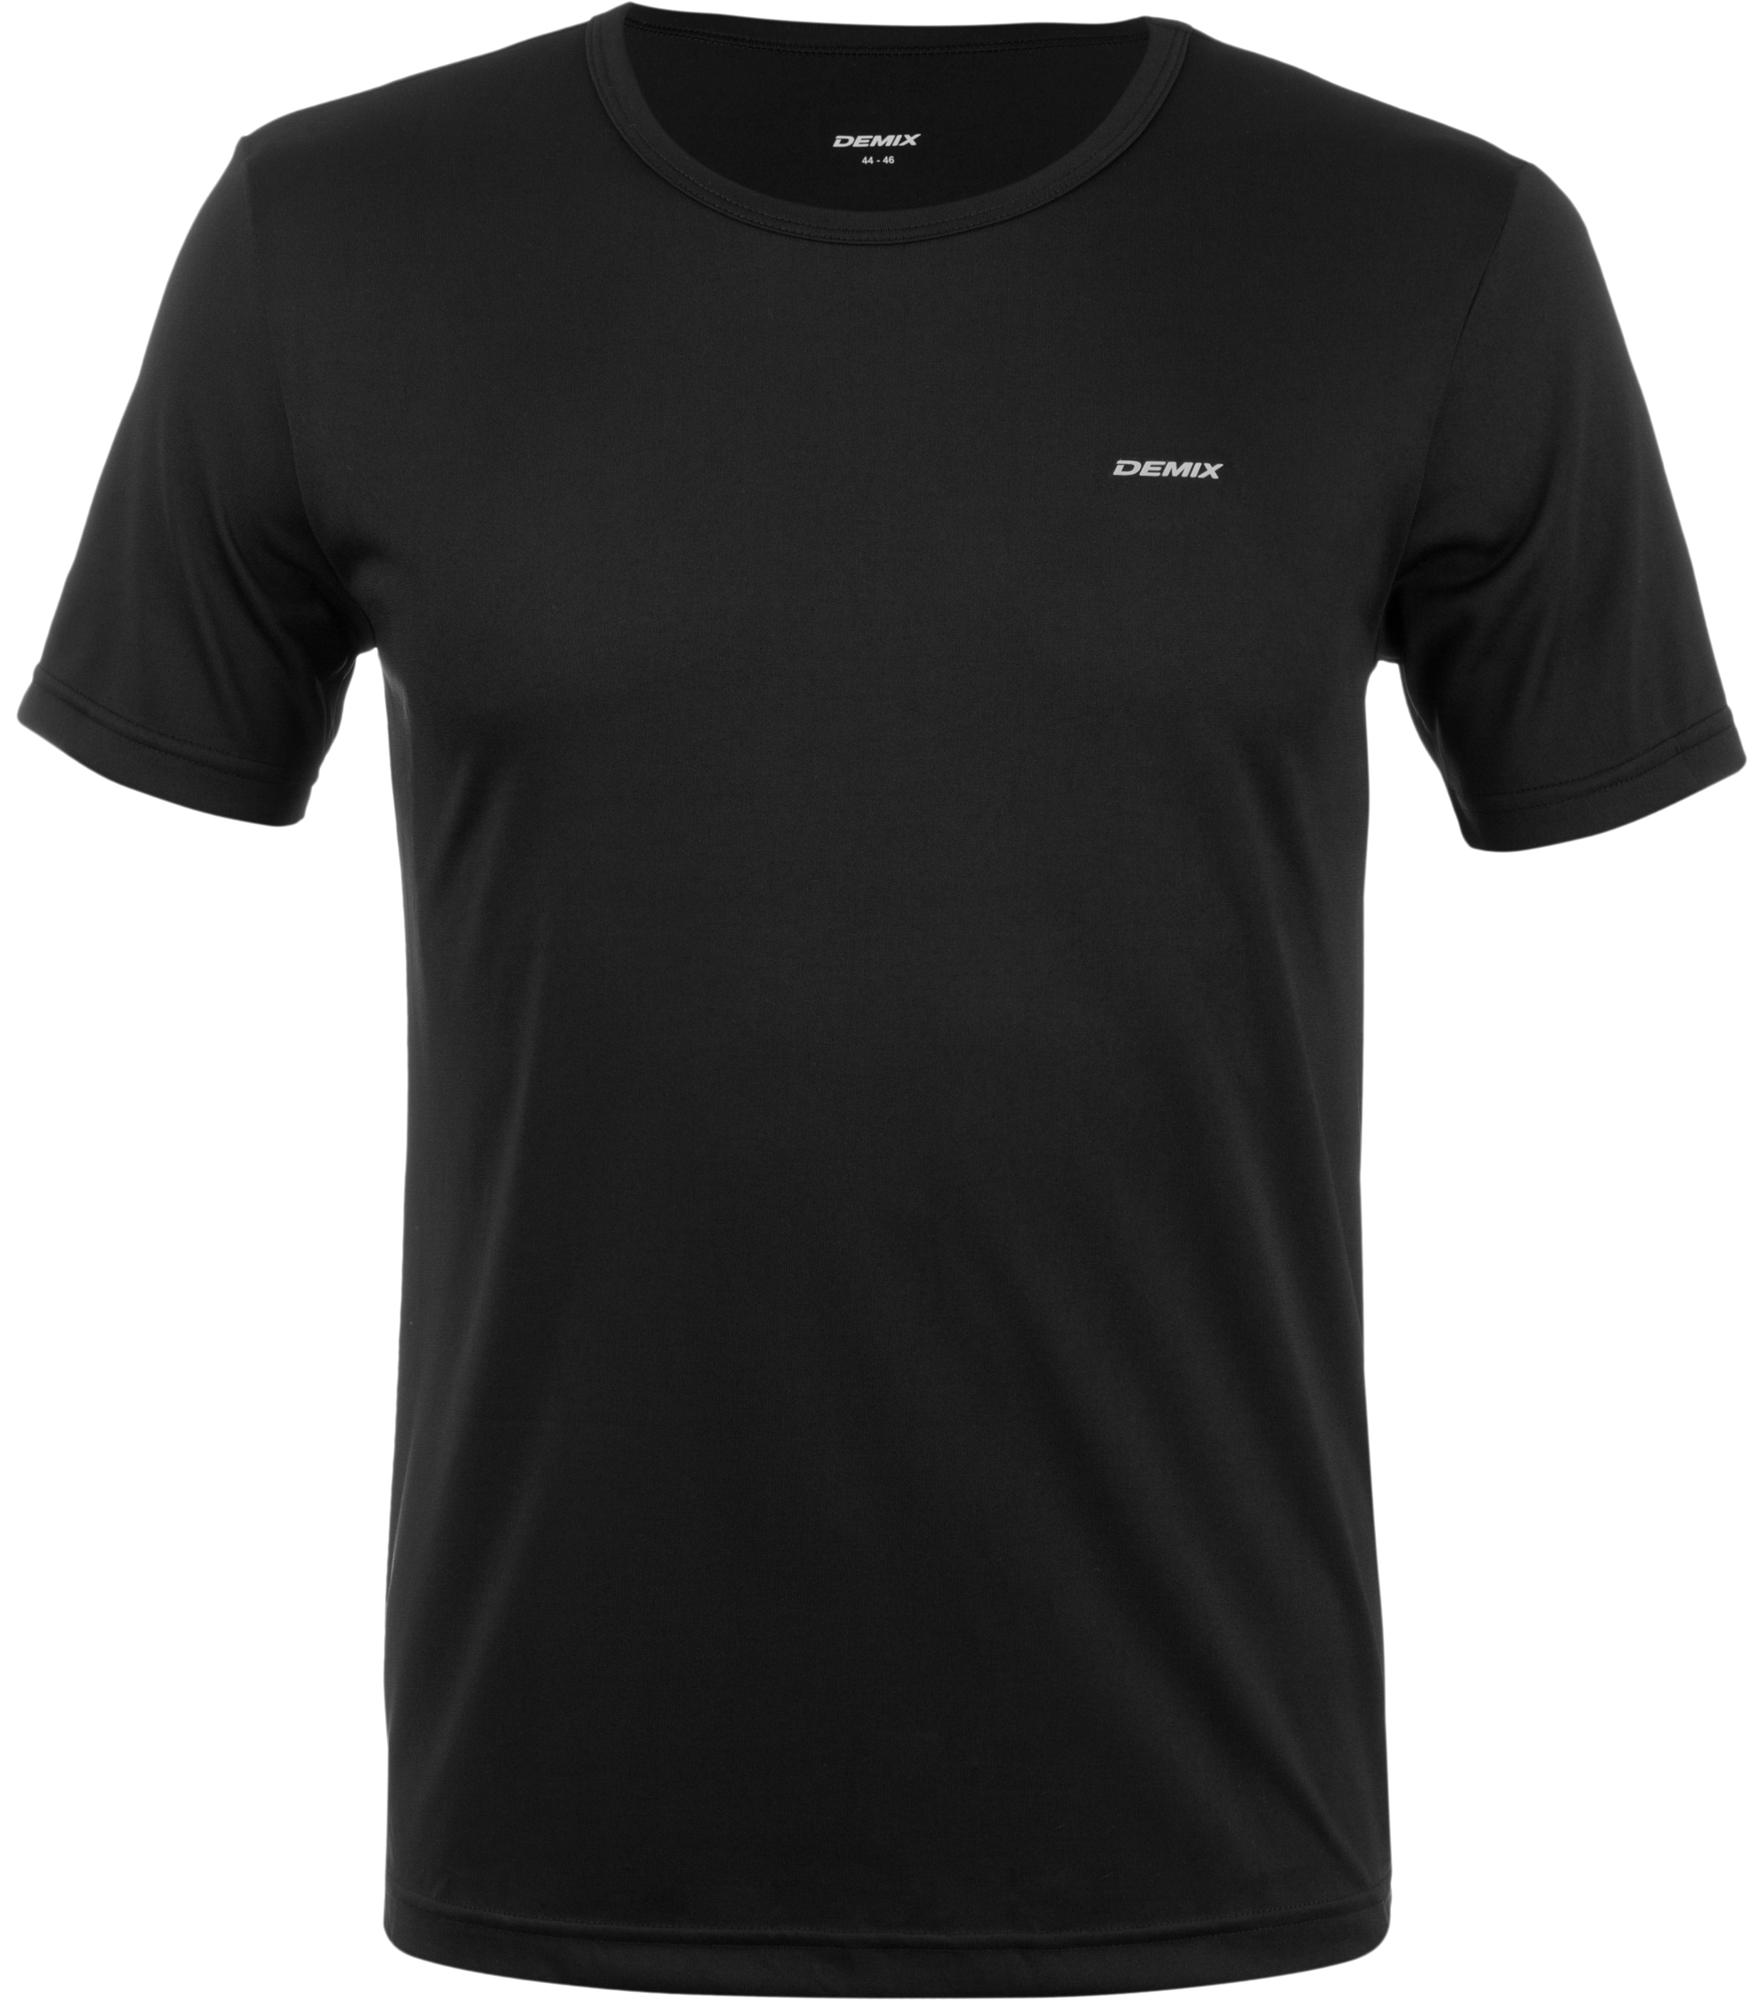 Demix Футболка мужская Demix футболка мужская esprit vd3649 2014 299